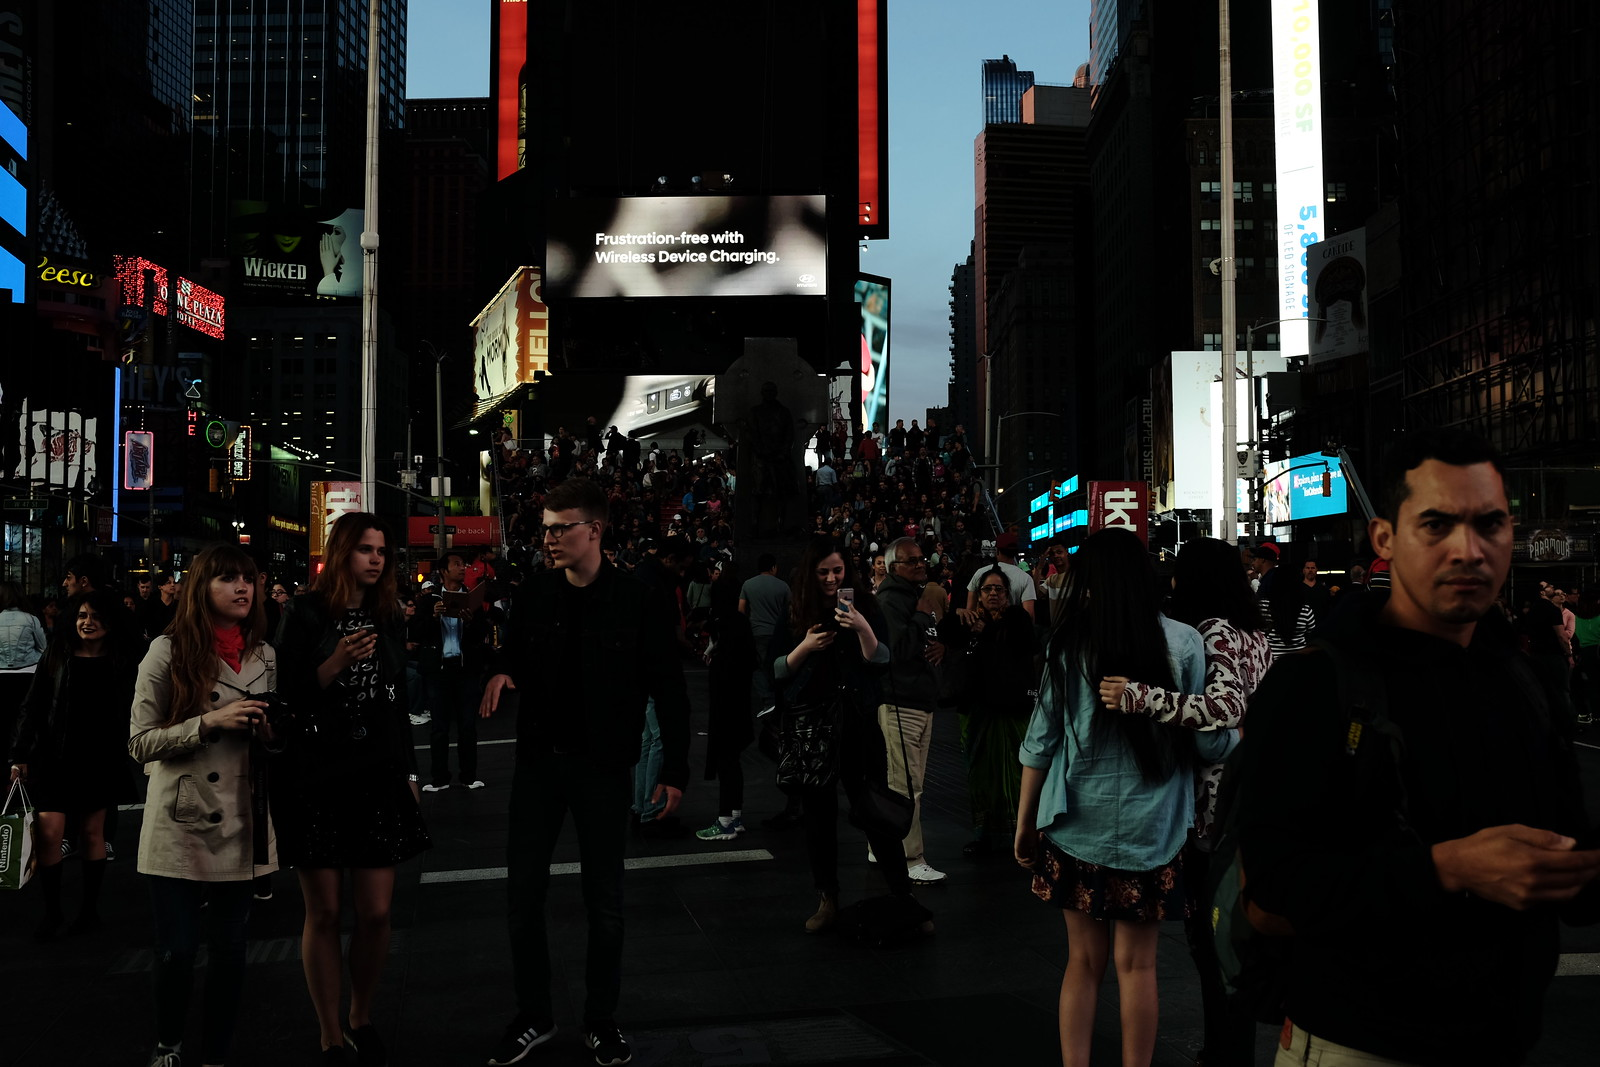 The New York Photo by FUJIFILM X100S(2017).